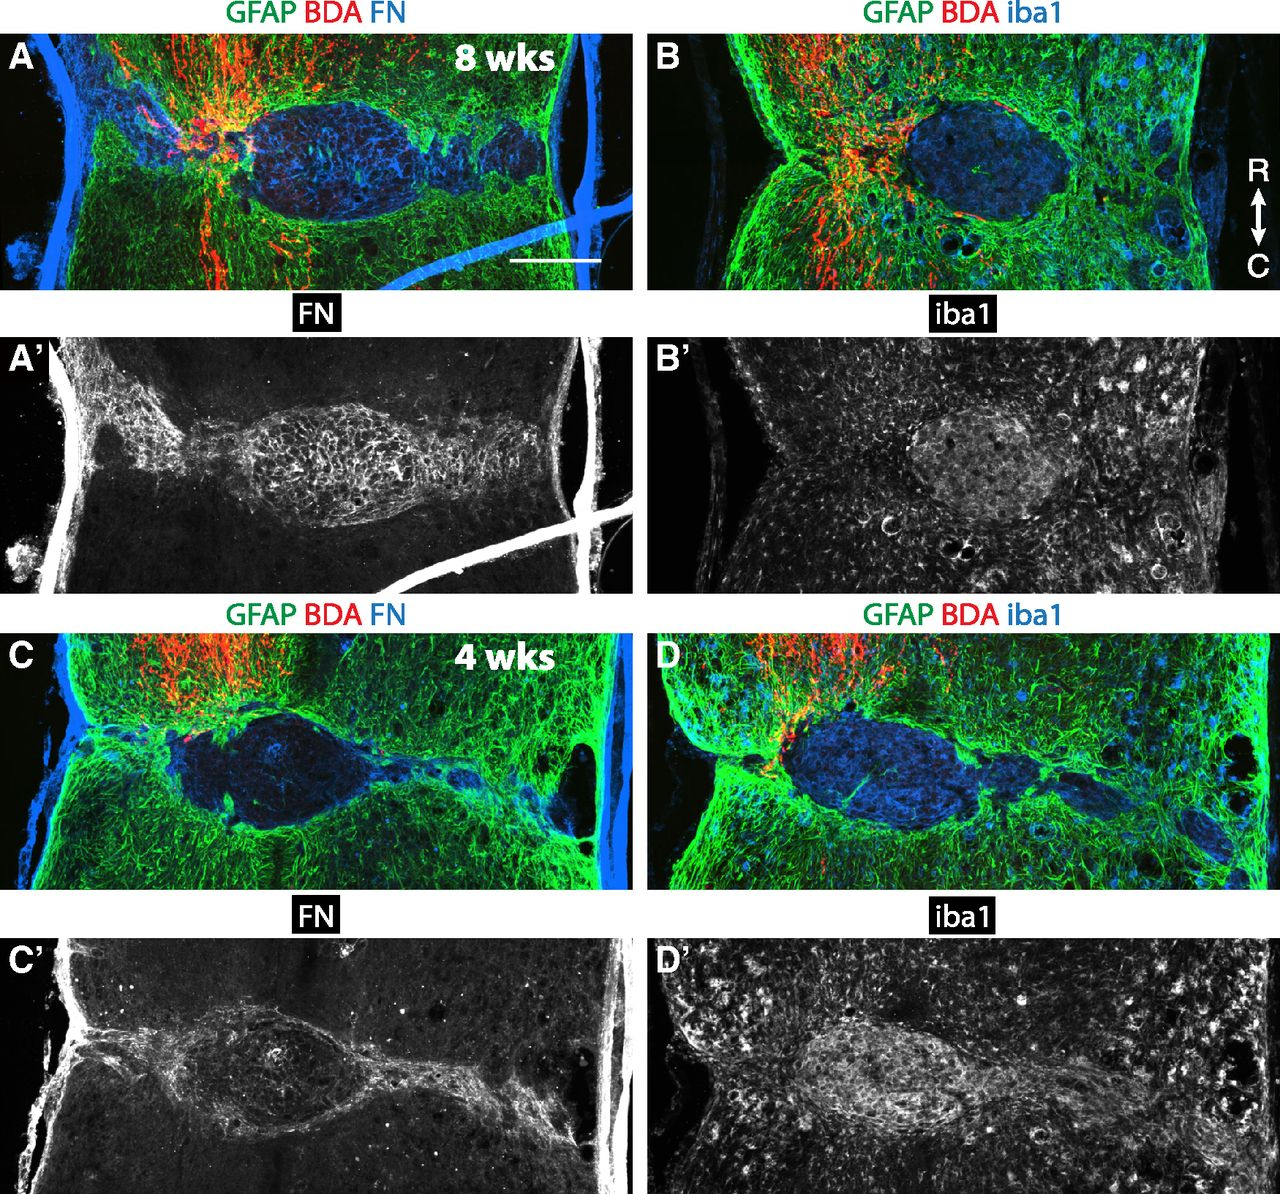 Short Hairpin RNA against PTEN Enhances Regenerative Growth